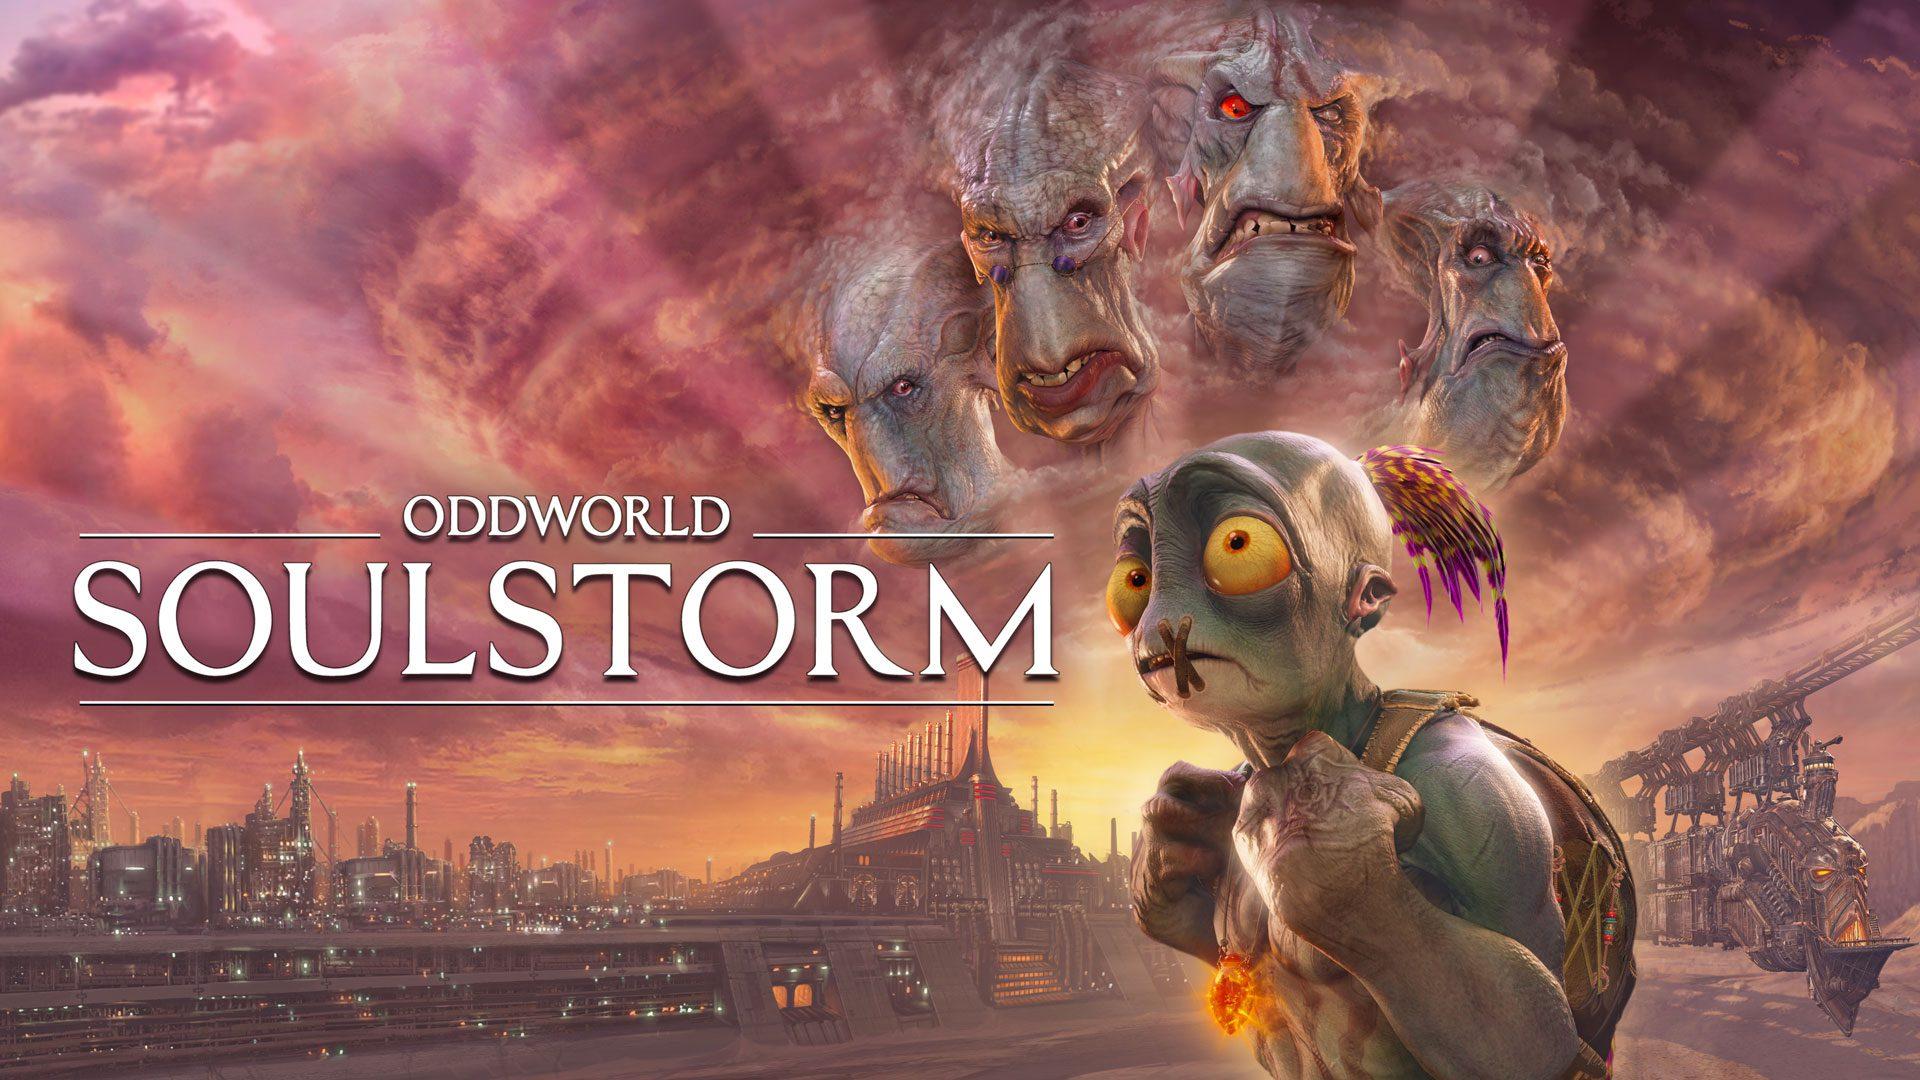 oddworld soulstorm - generacion xbox